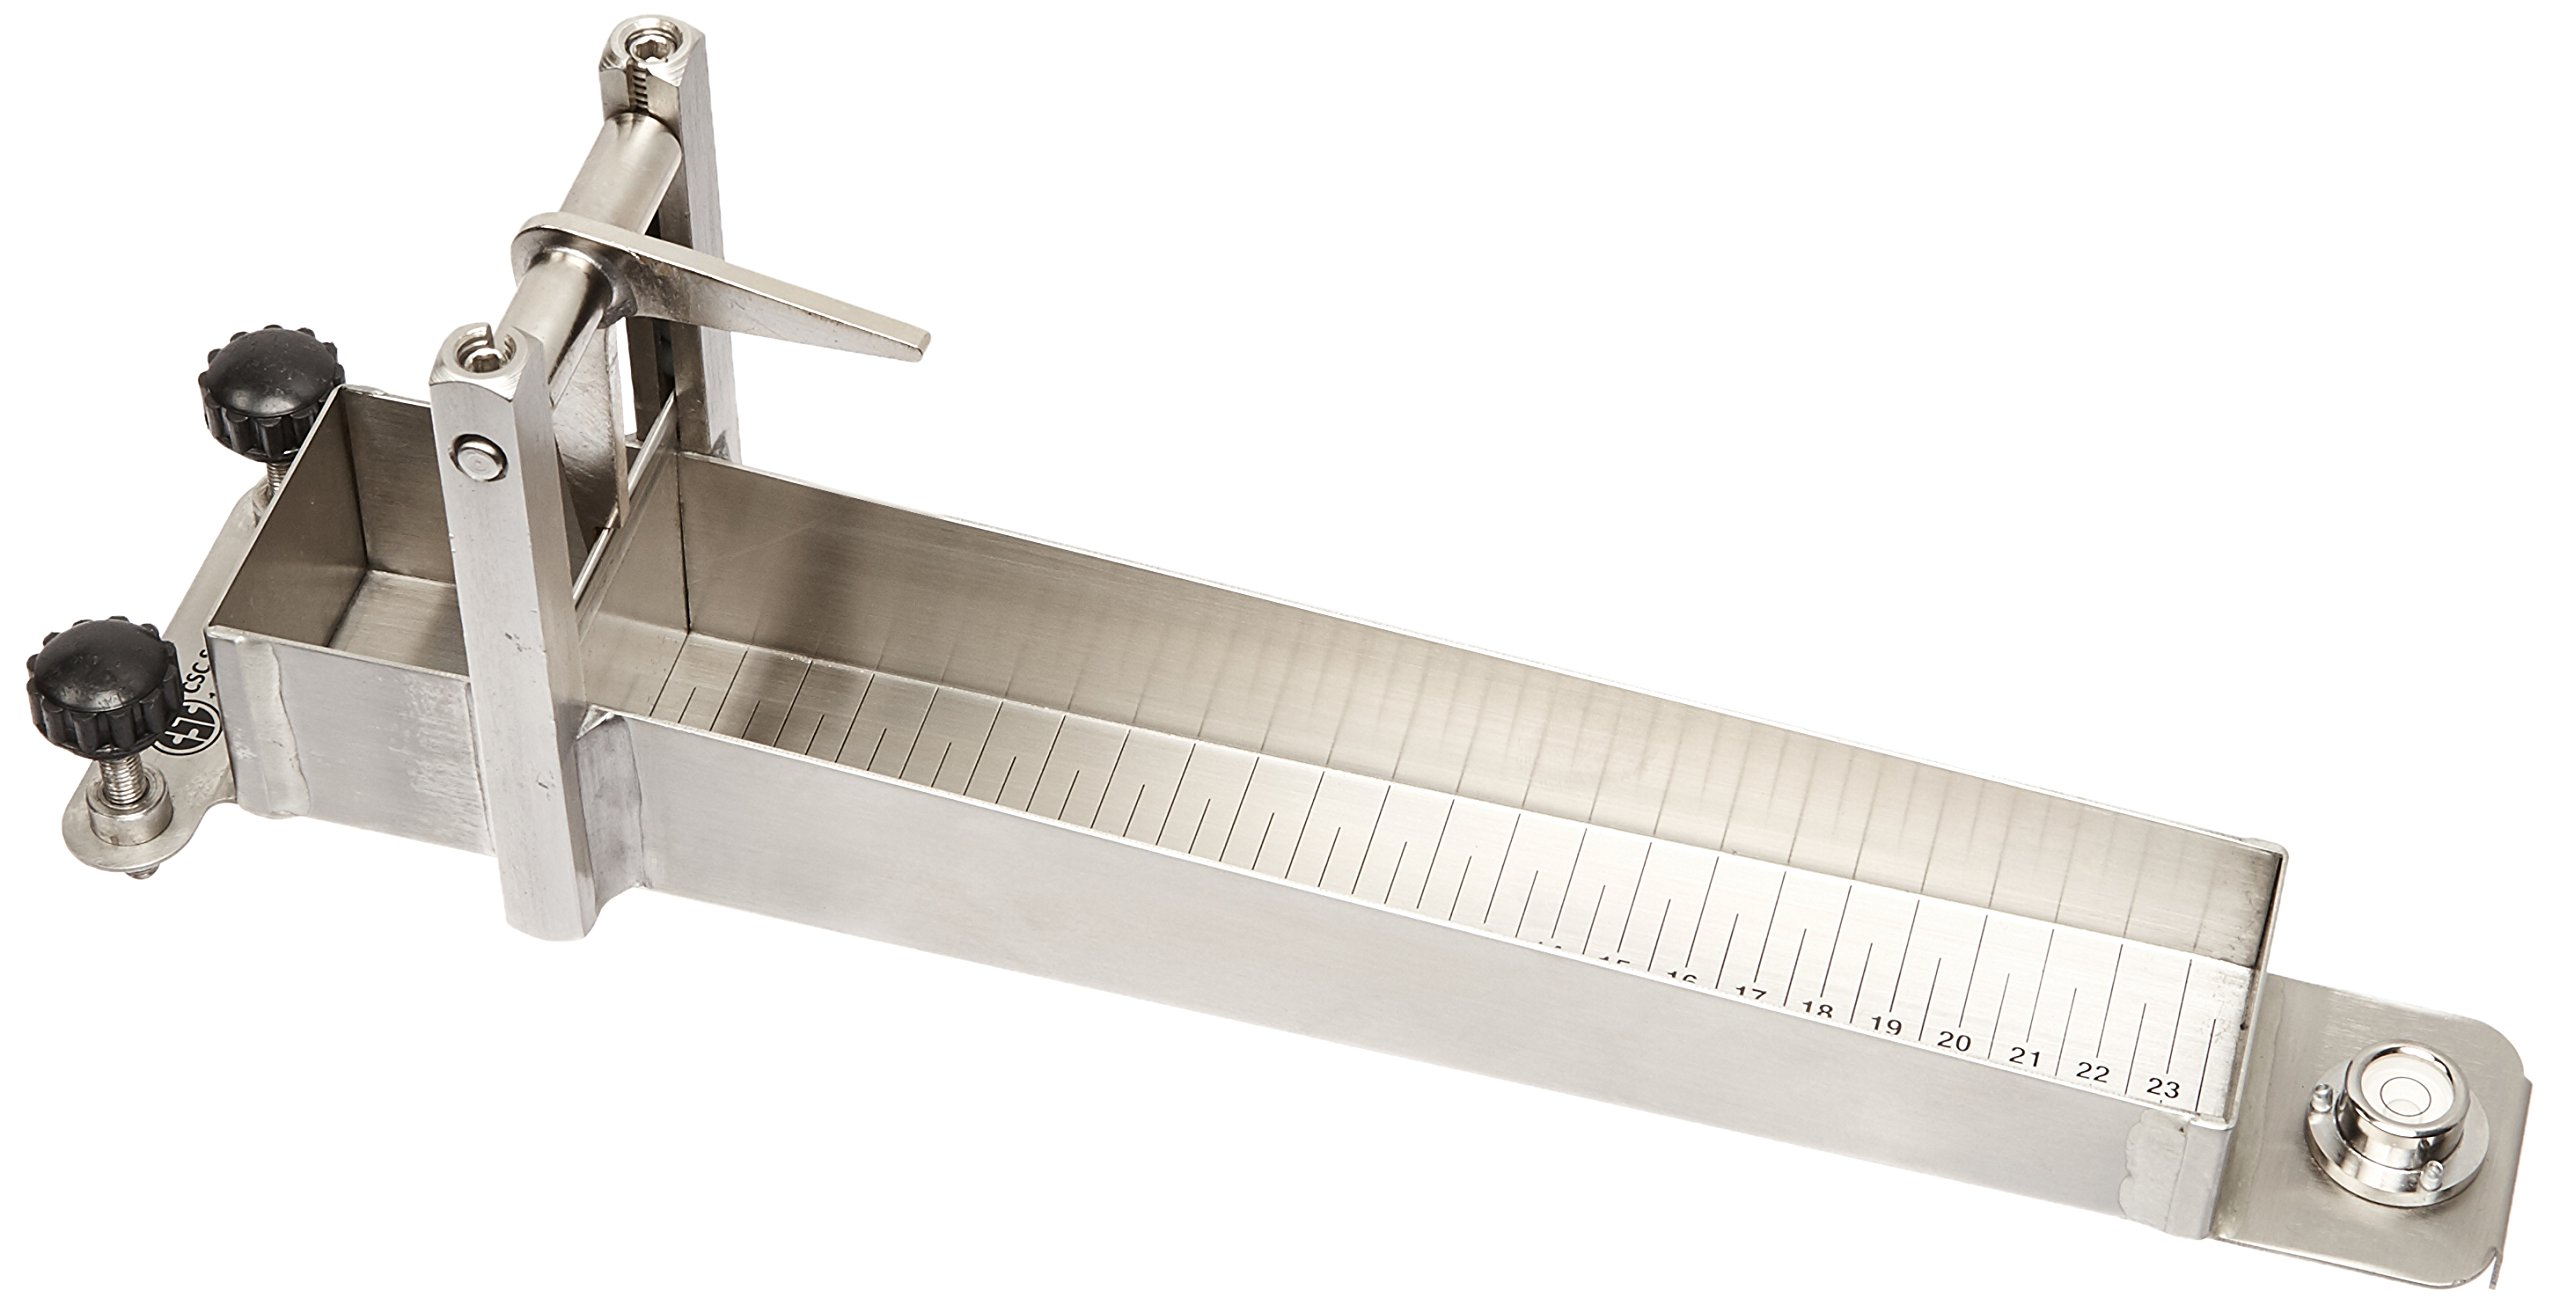 CSC Scientific 24925000 Bostwick Consistometer by CSC Scientific (Image #1)